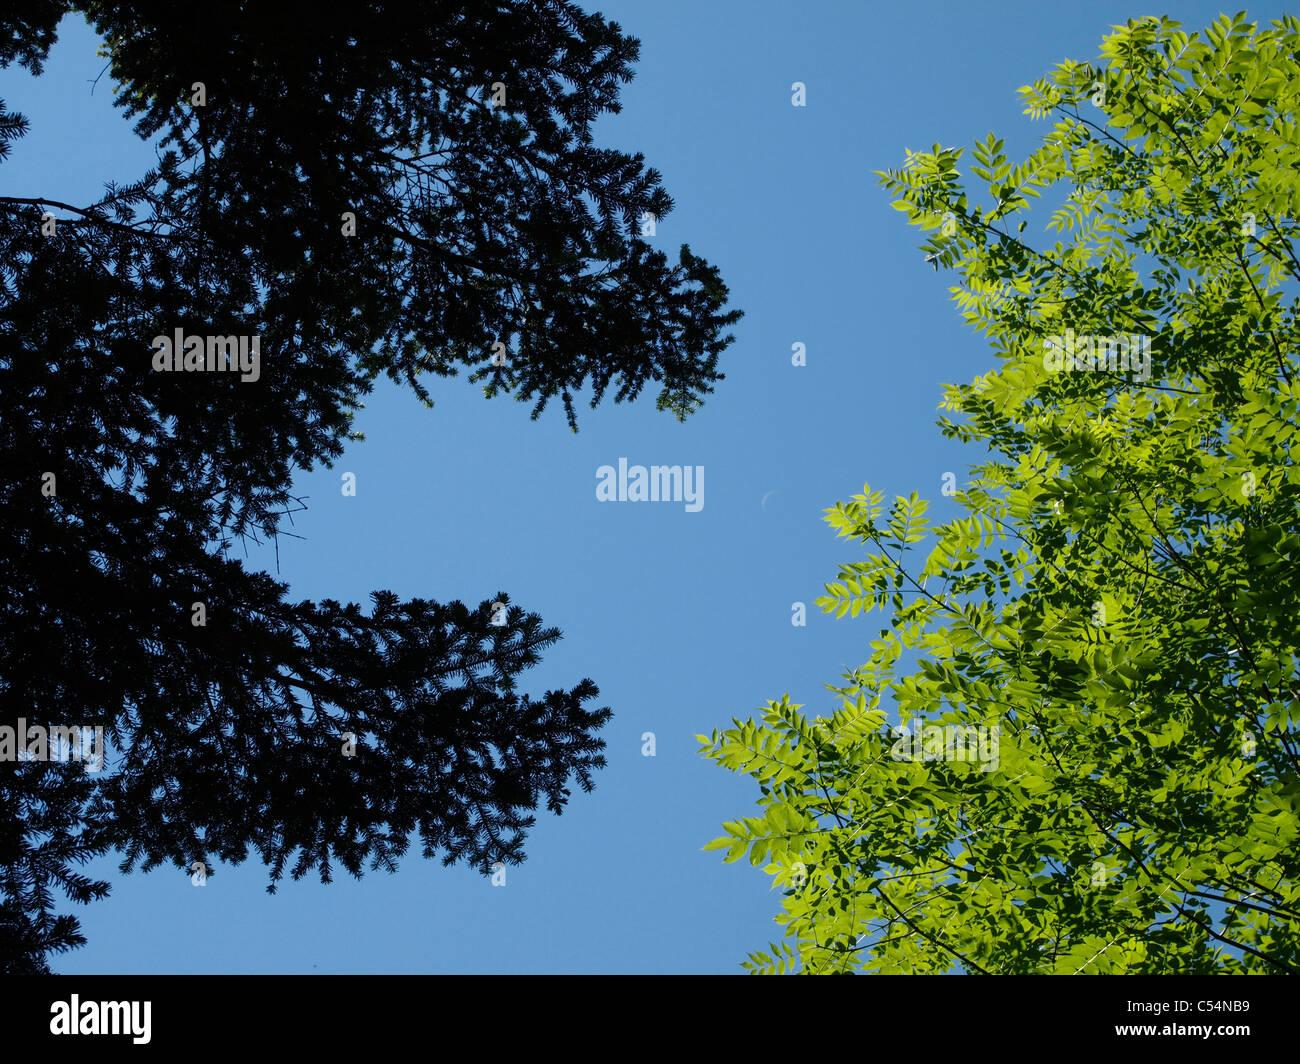 Sunlit tree leaves, la Chartreuse, France - Stock Image